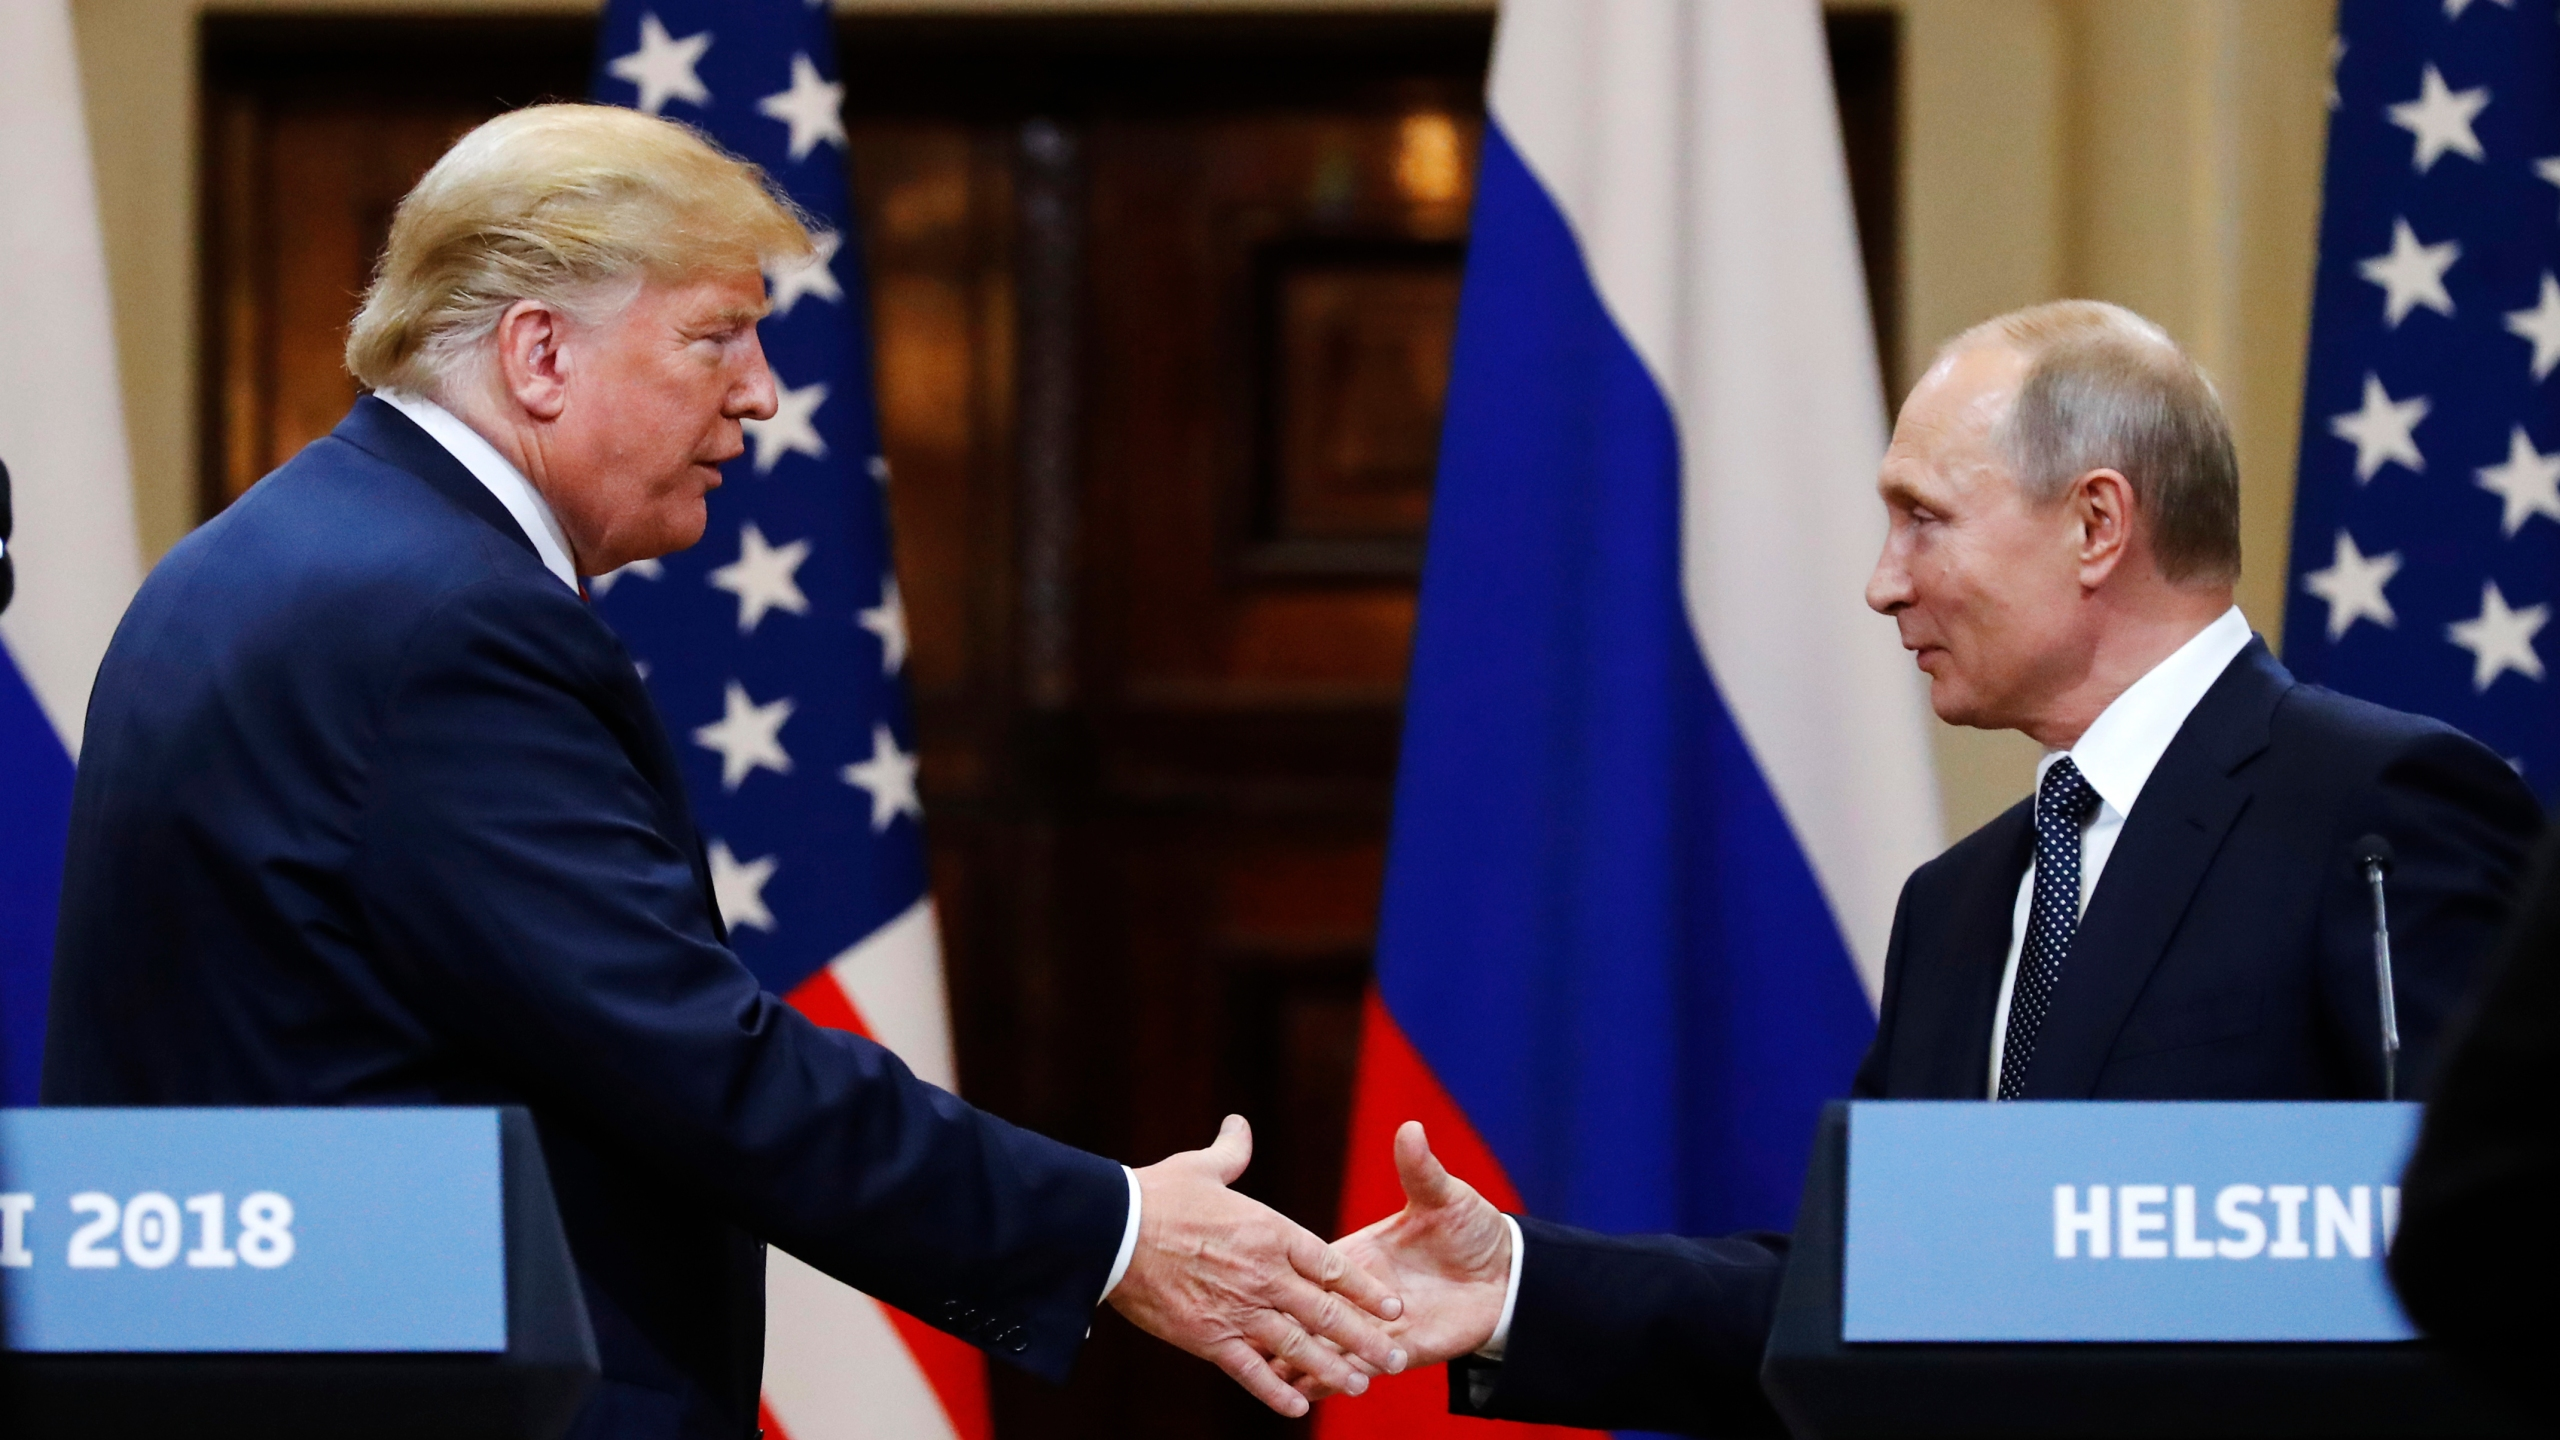 APTOPIX_Finland_Trump_Putin_Summit_66350-159532.jpg38438806